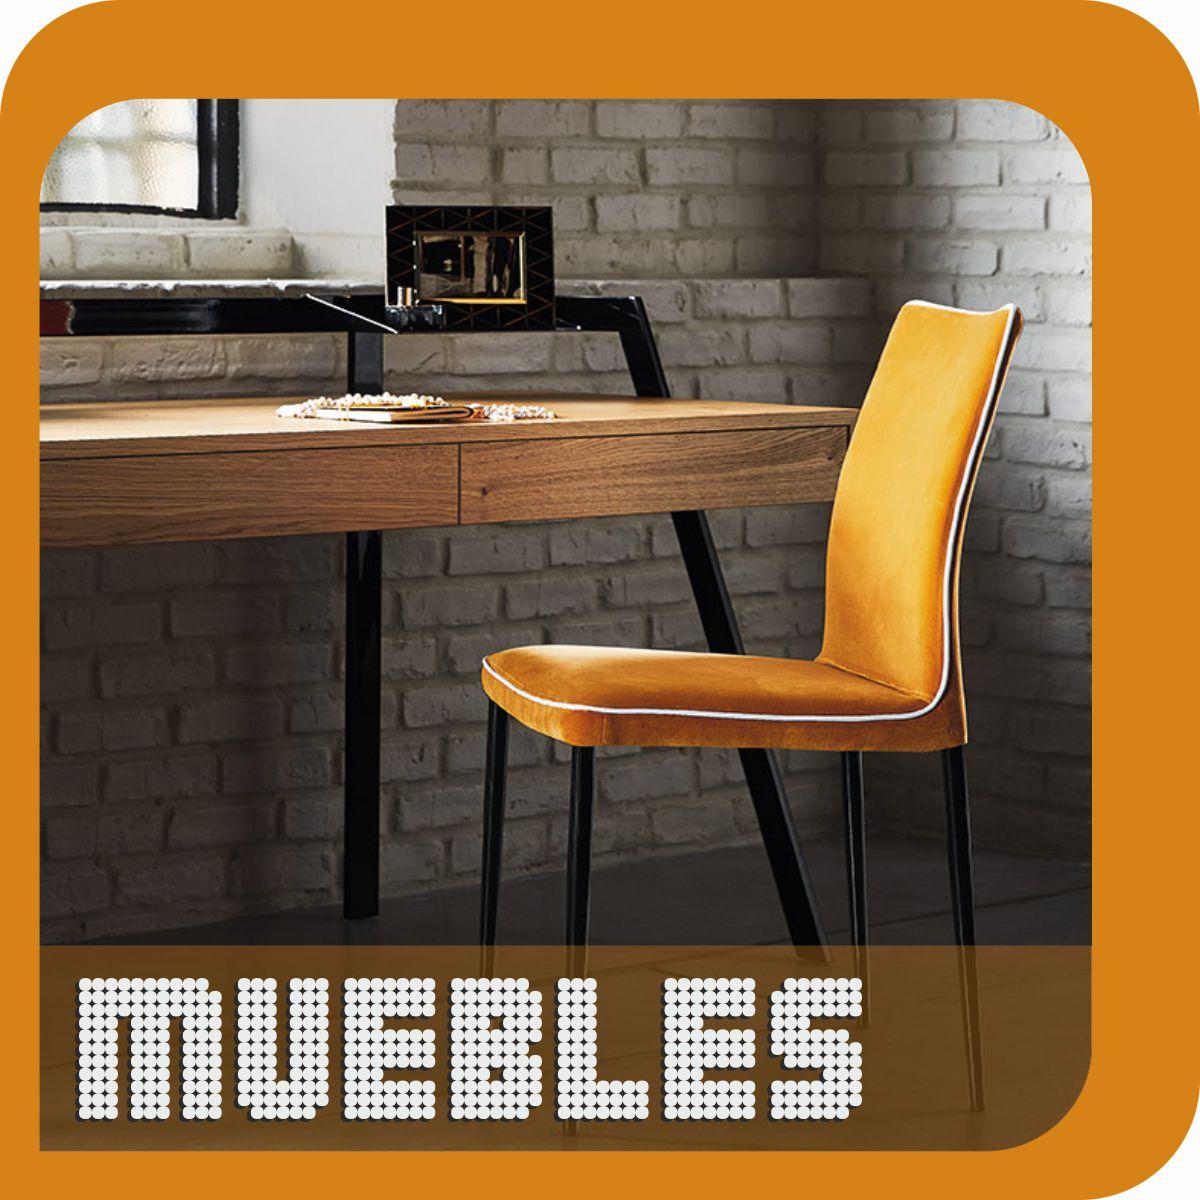 Furniture design and advice on decoration in Las Palmas